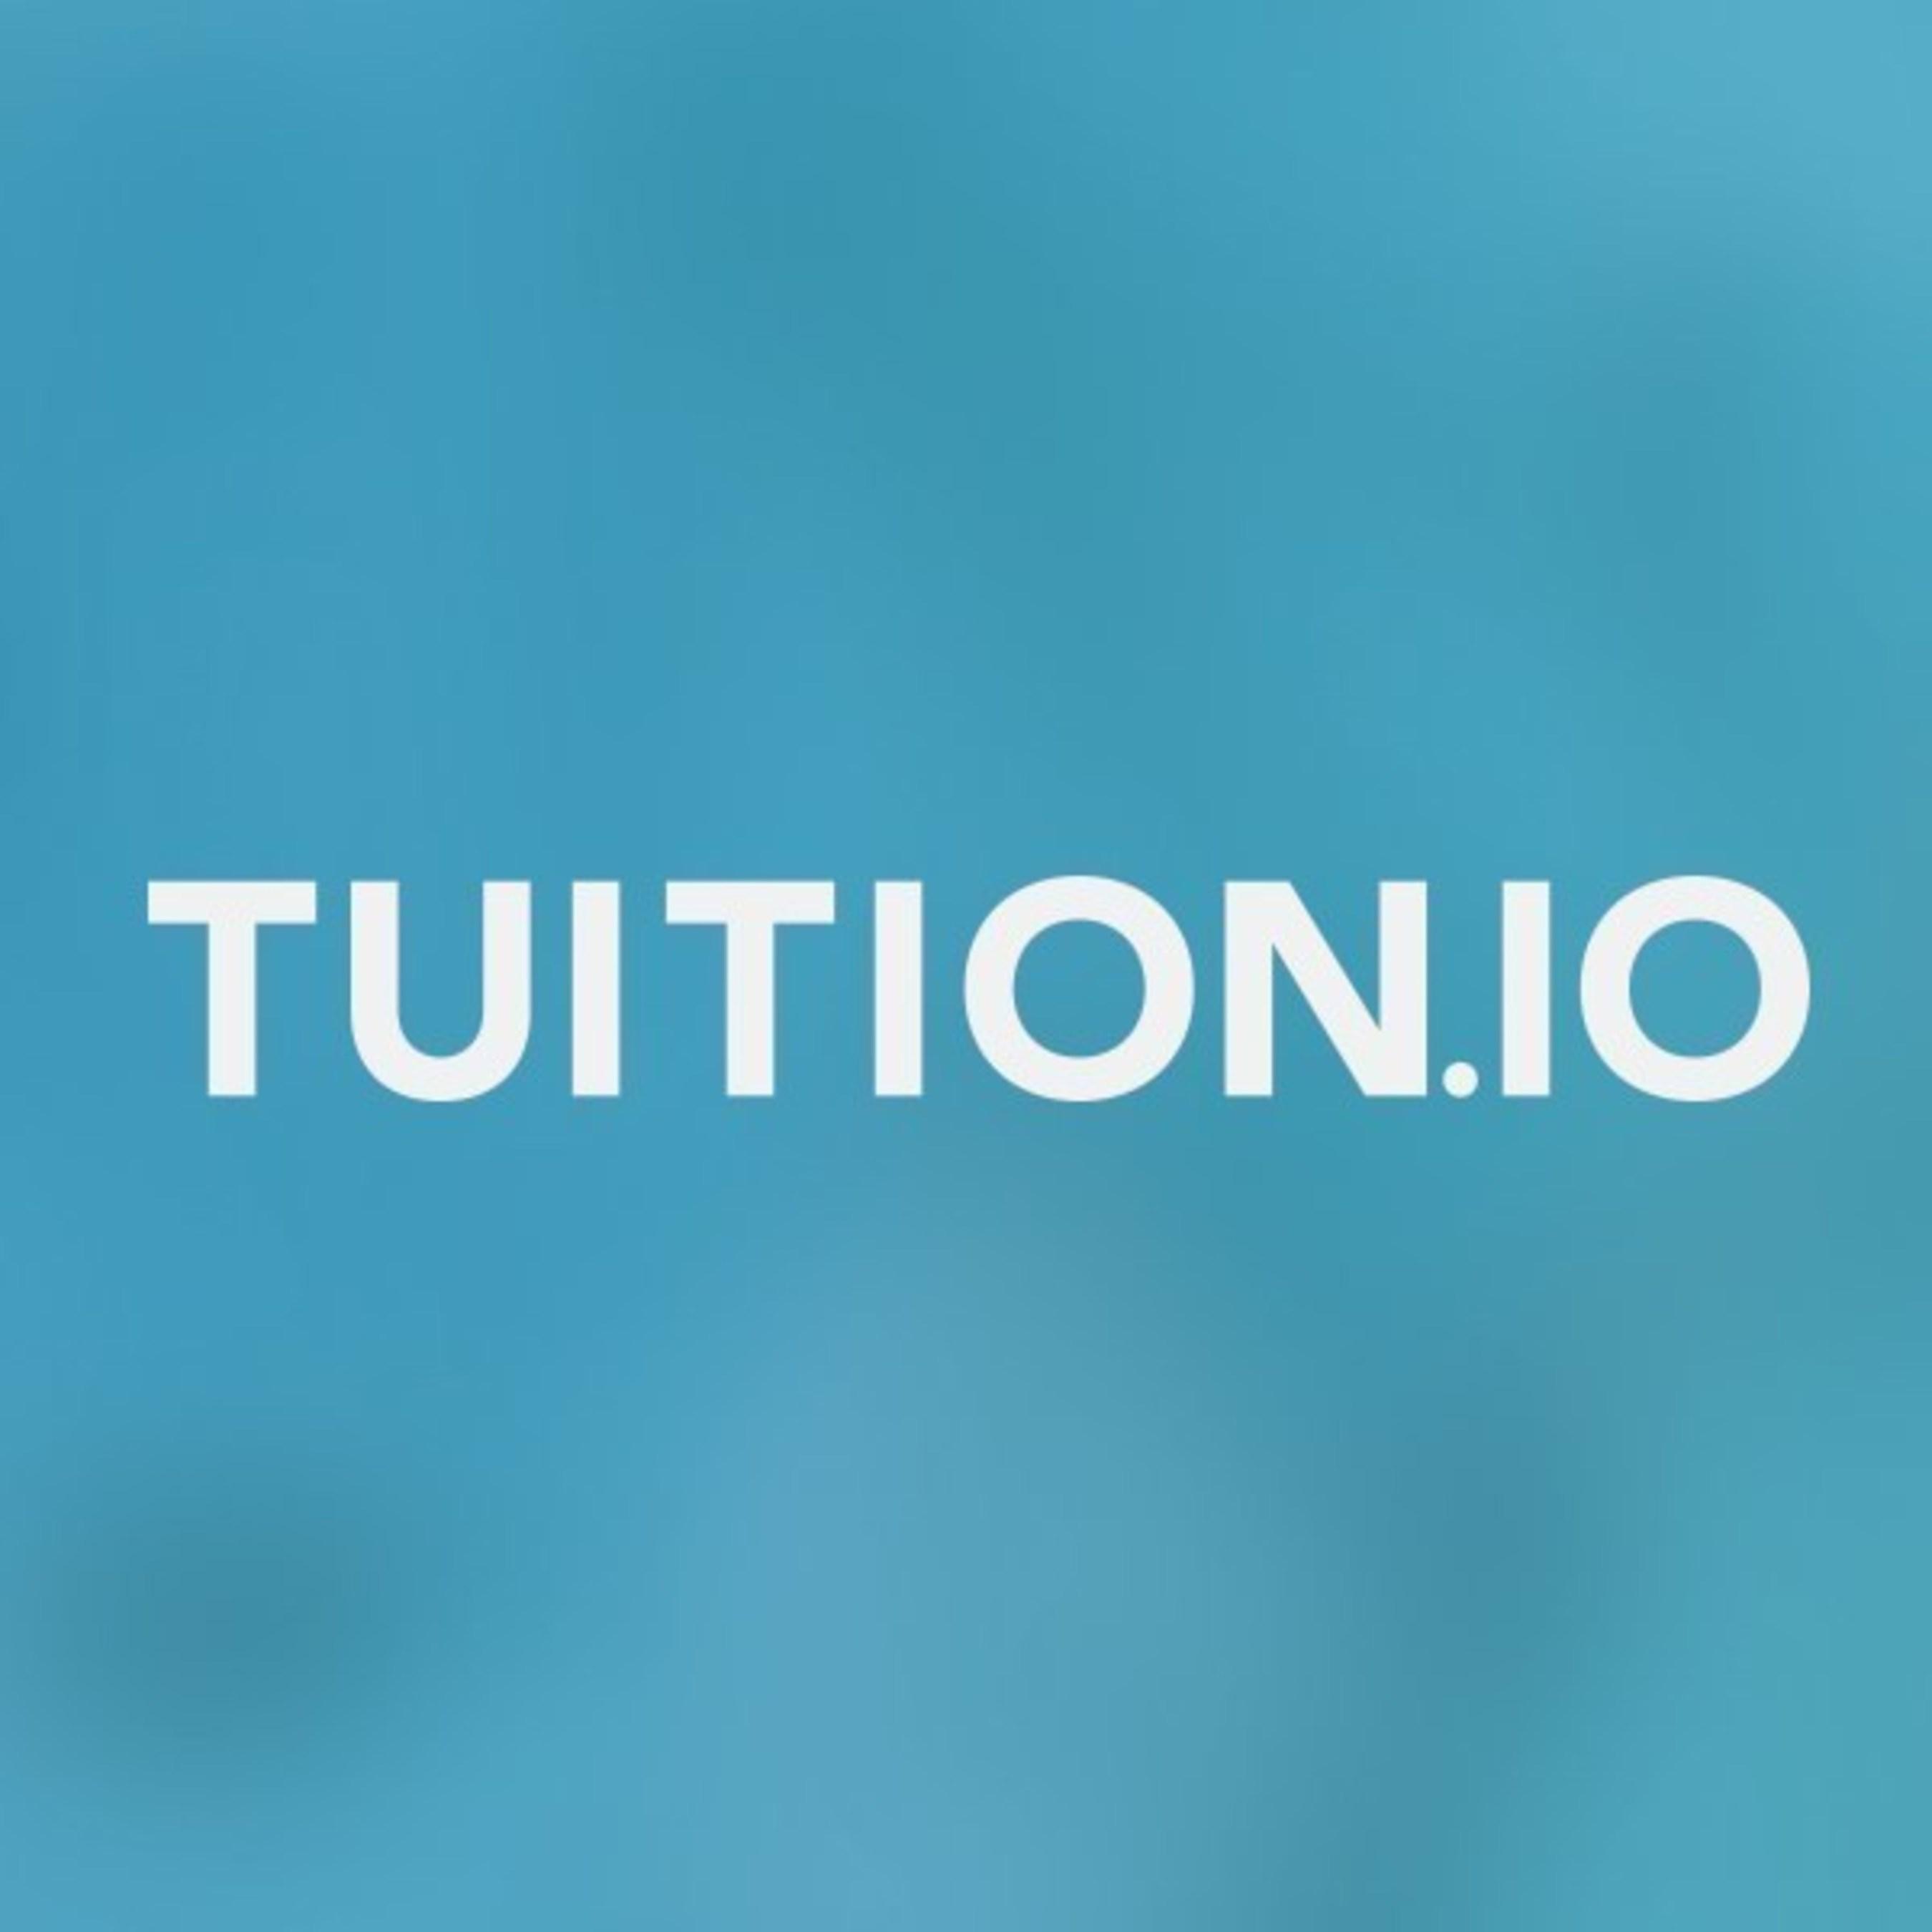 Tuition.io